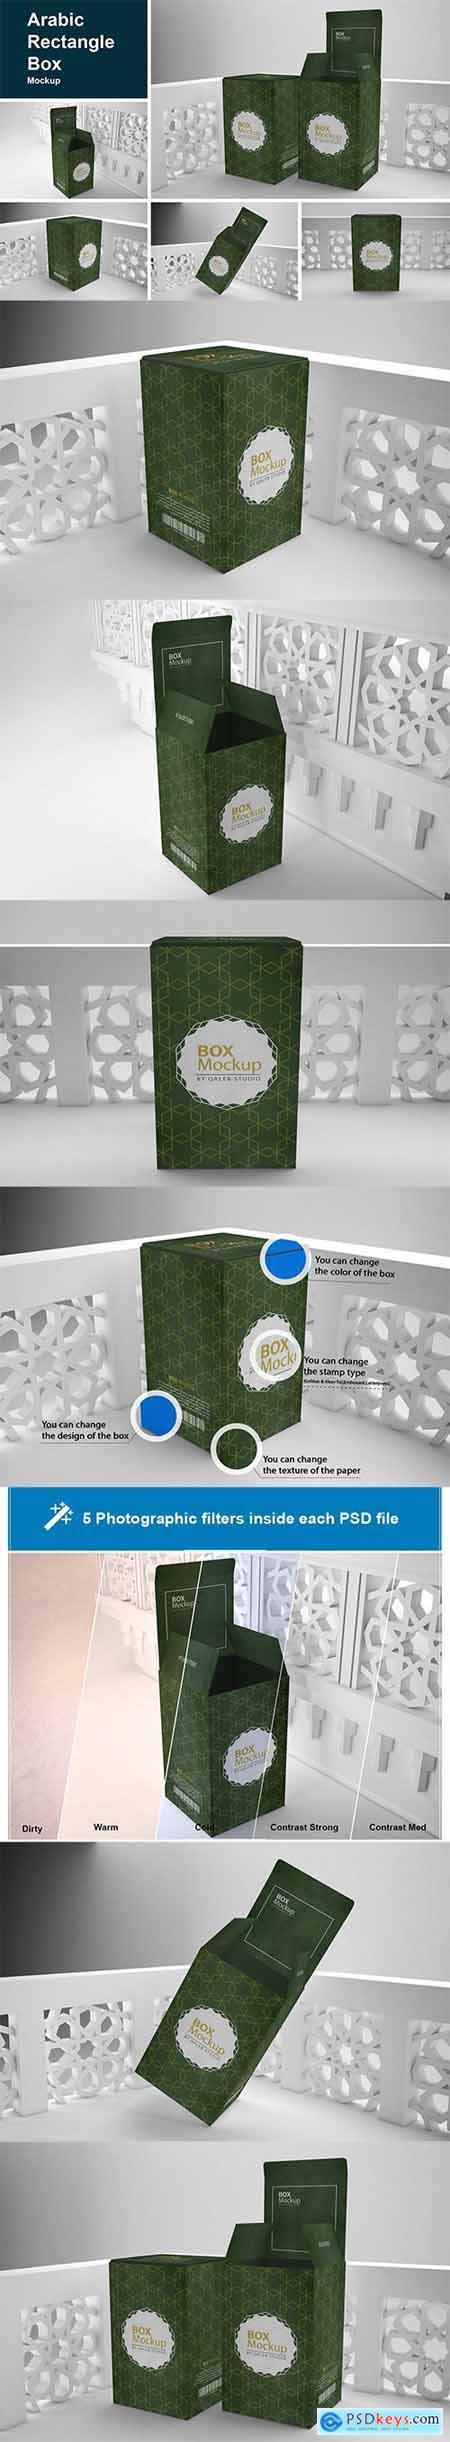 Arabic Rectangle Box Mockup